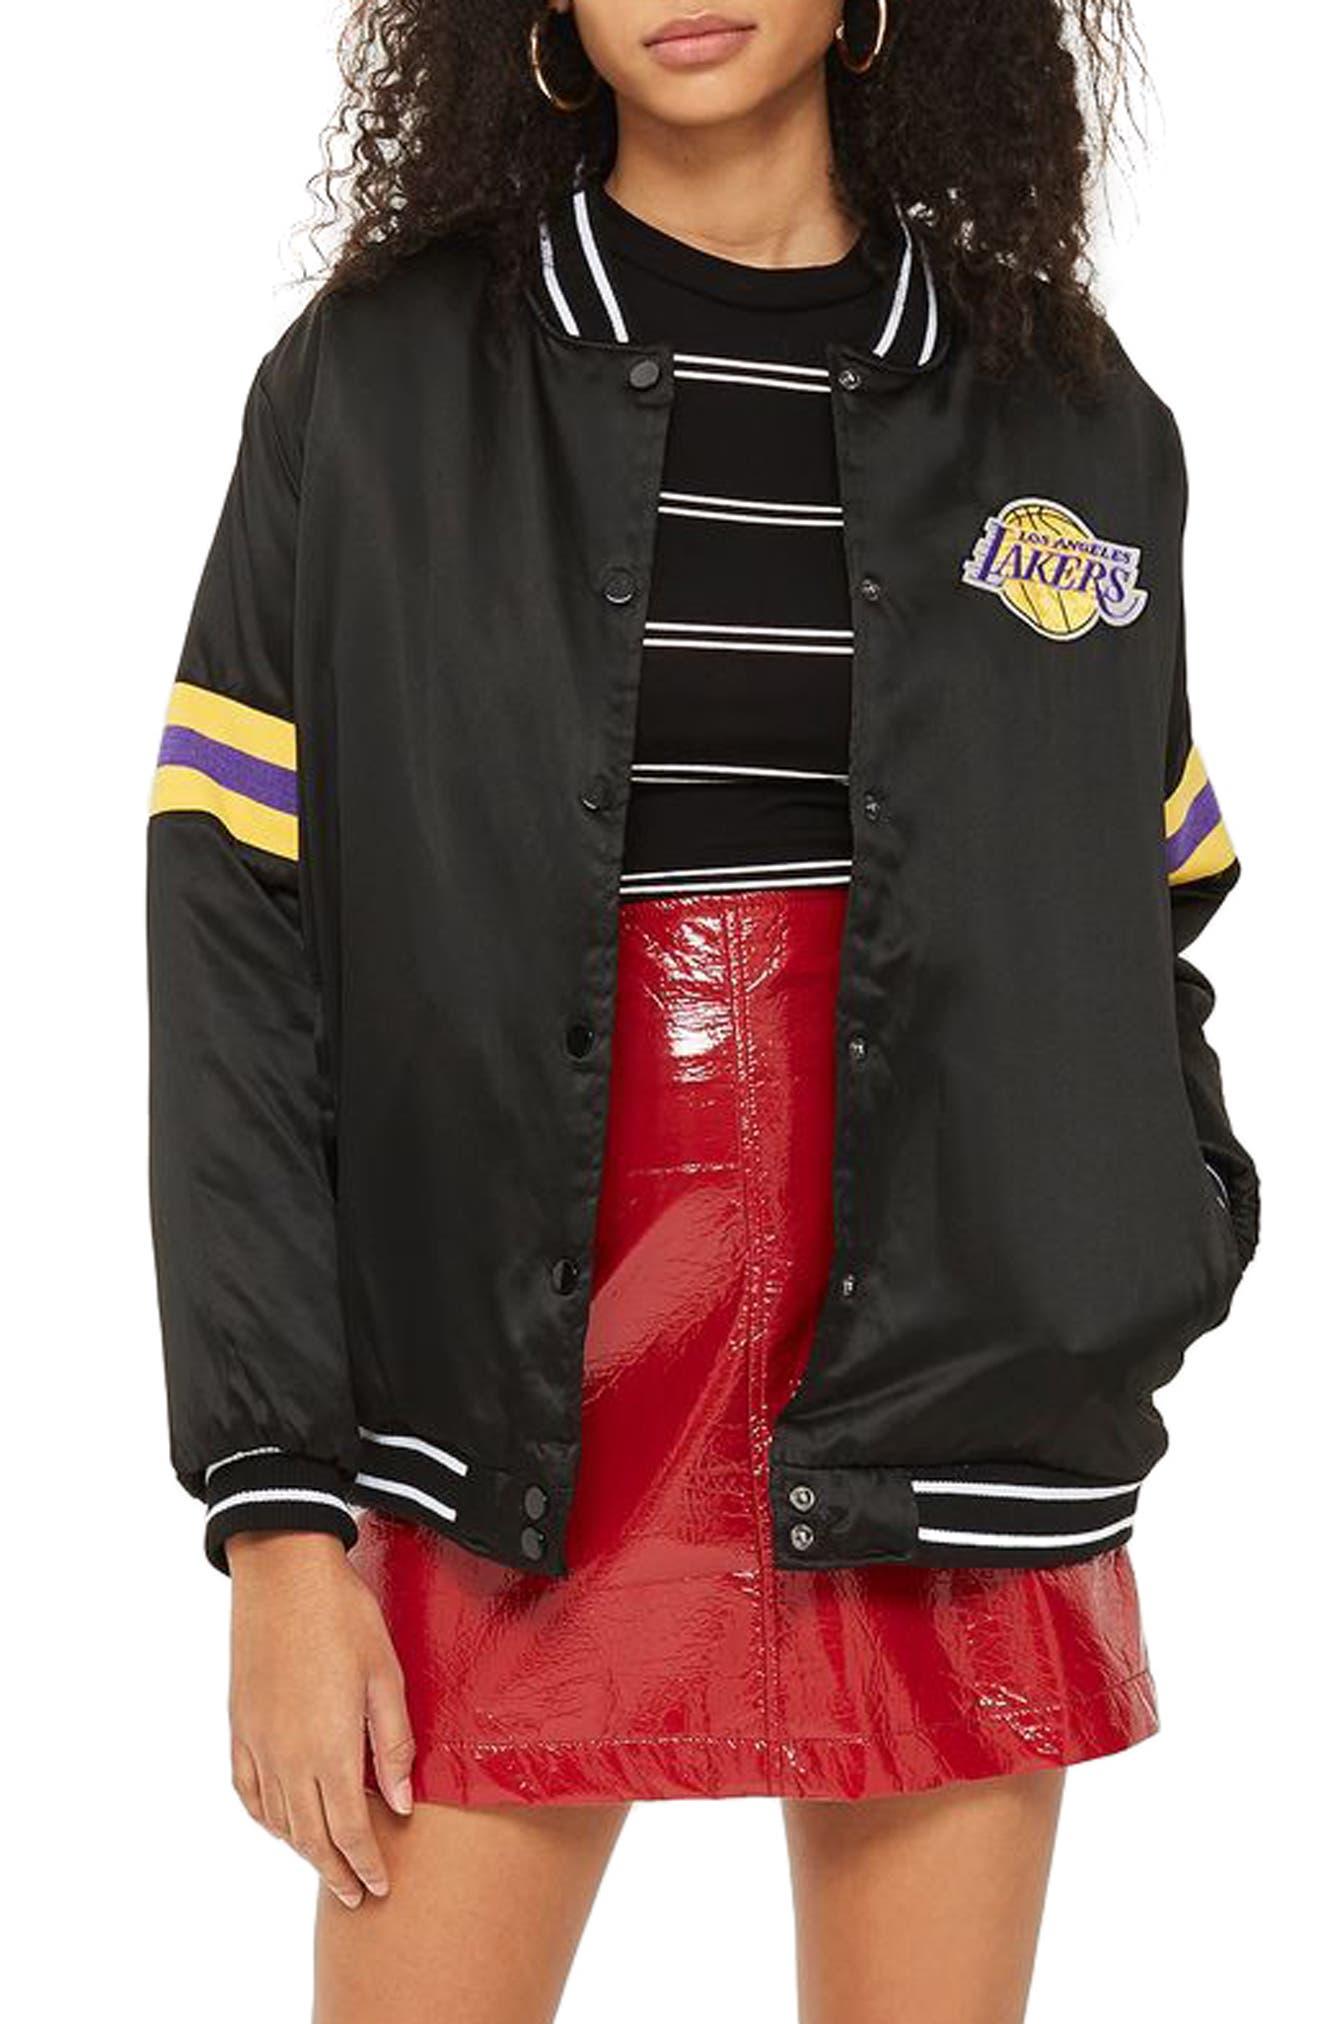 Main Image - Topshop x UNK Lakers Bomber Jacket